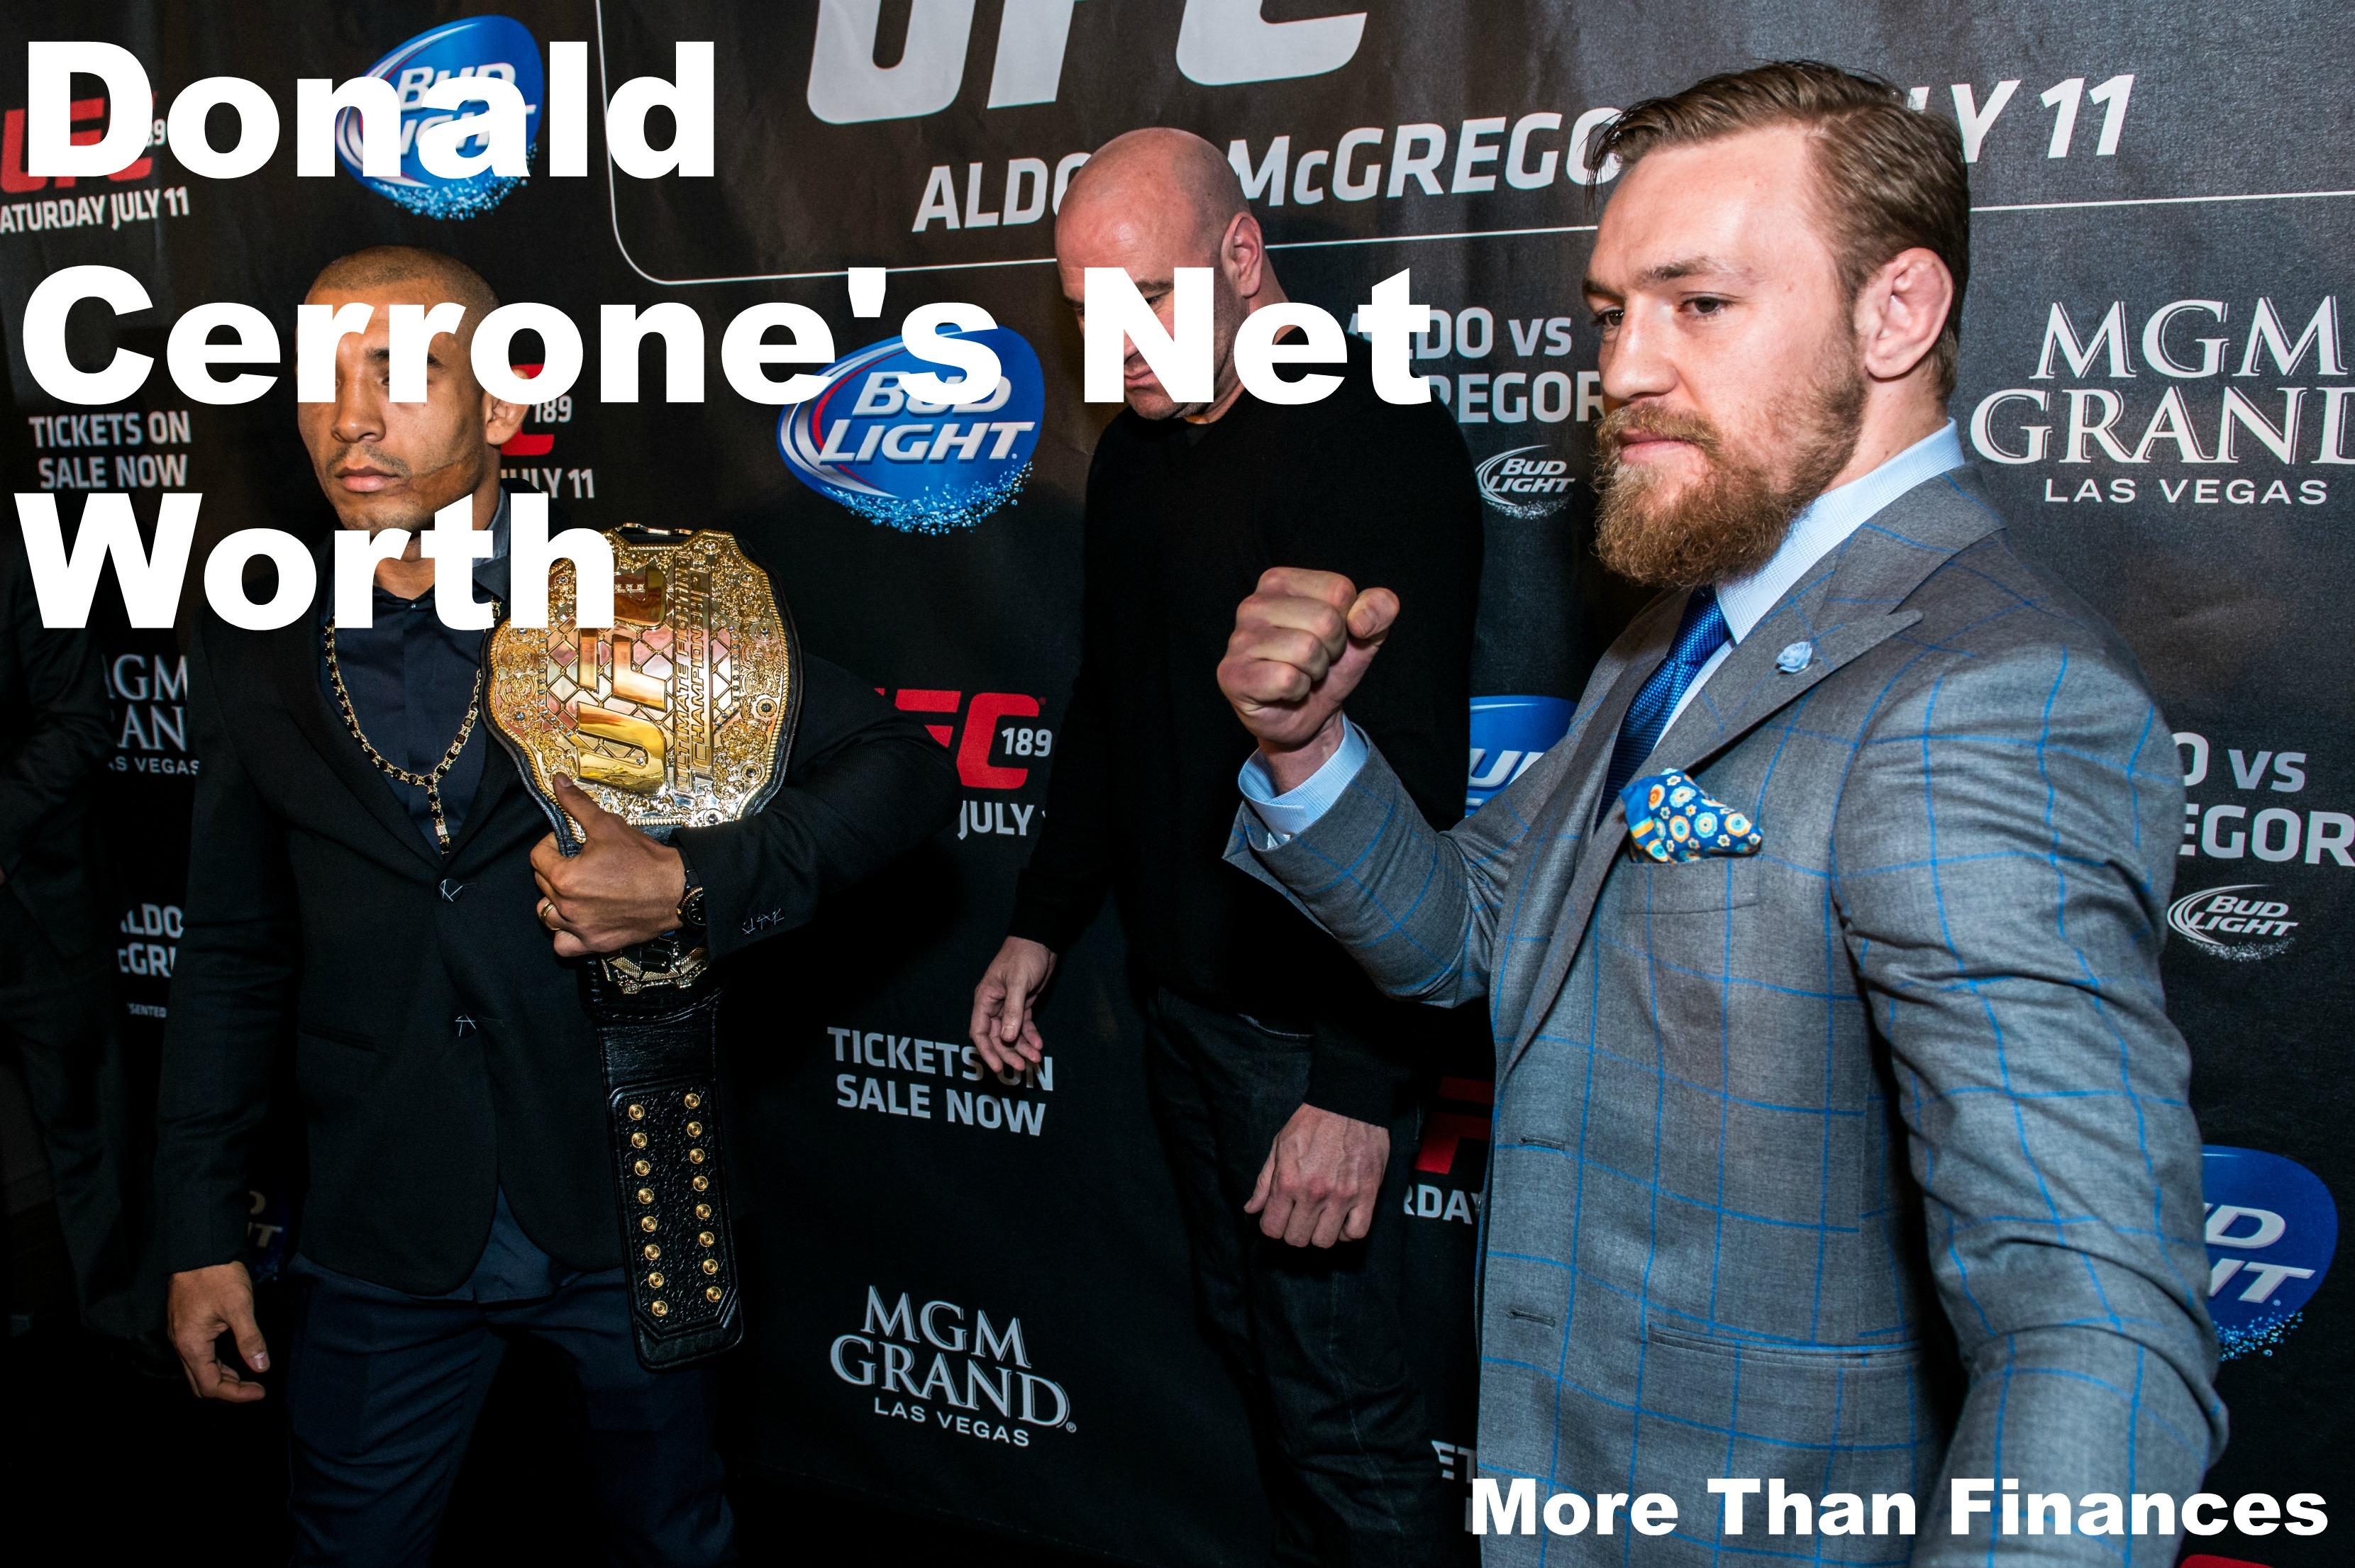 Donald Cerrone's Net Worth